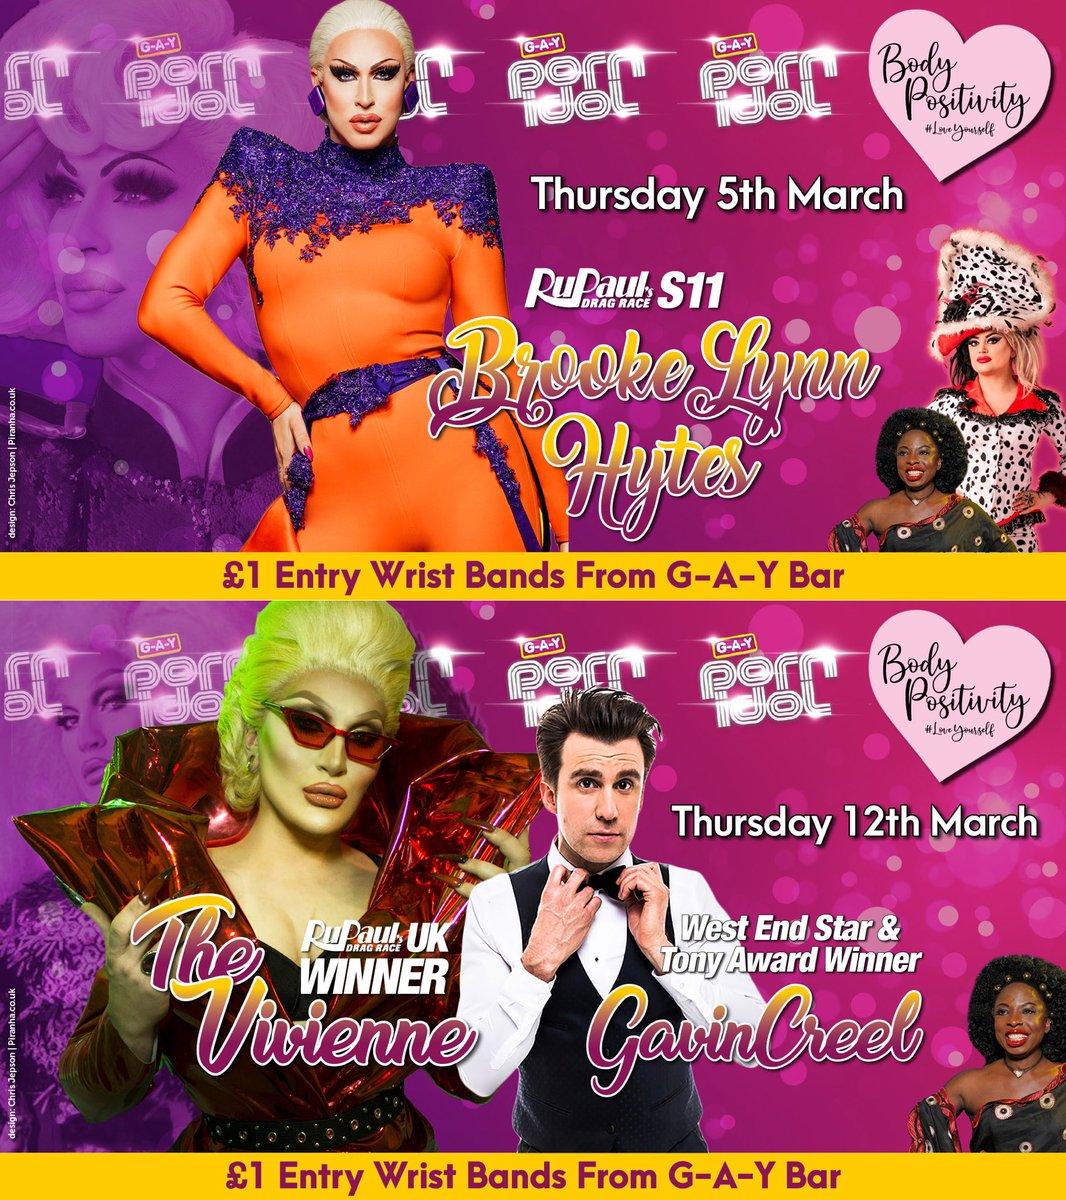 G-A-Y Porn Idol Judges  Next Thursday  @RuPaulsDragRace S11 Runner Up @Bhytes1  @dragraceukbbc 🍟 @ChipShopBird  & @SonofaTutu  Thurs 12th March  @dragraceukbbc Winner @THEVIVIENNEUK  Tony Award Winner @gavincreel  & @SonofaTutu   #DragRace #BodyPositivity #LoveYourself #Heaven40